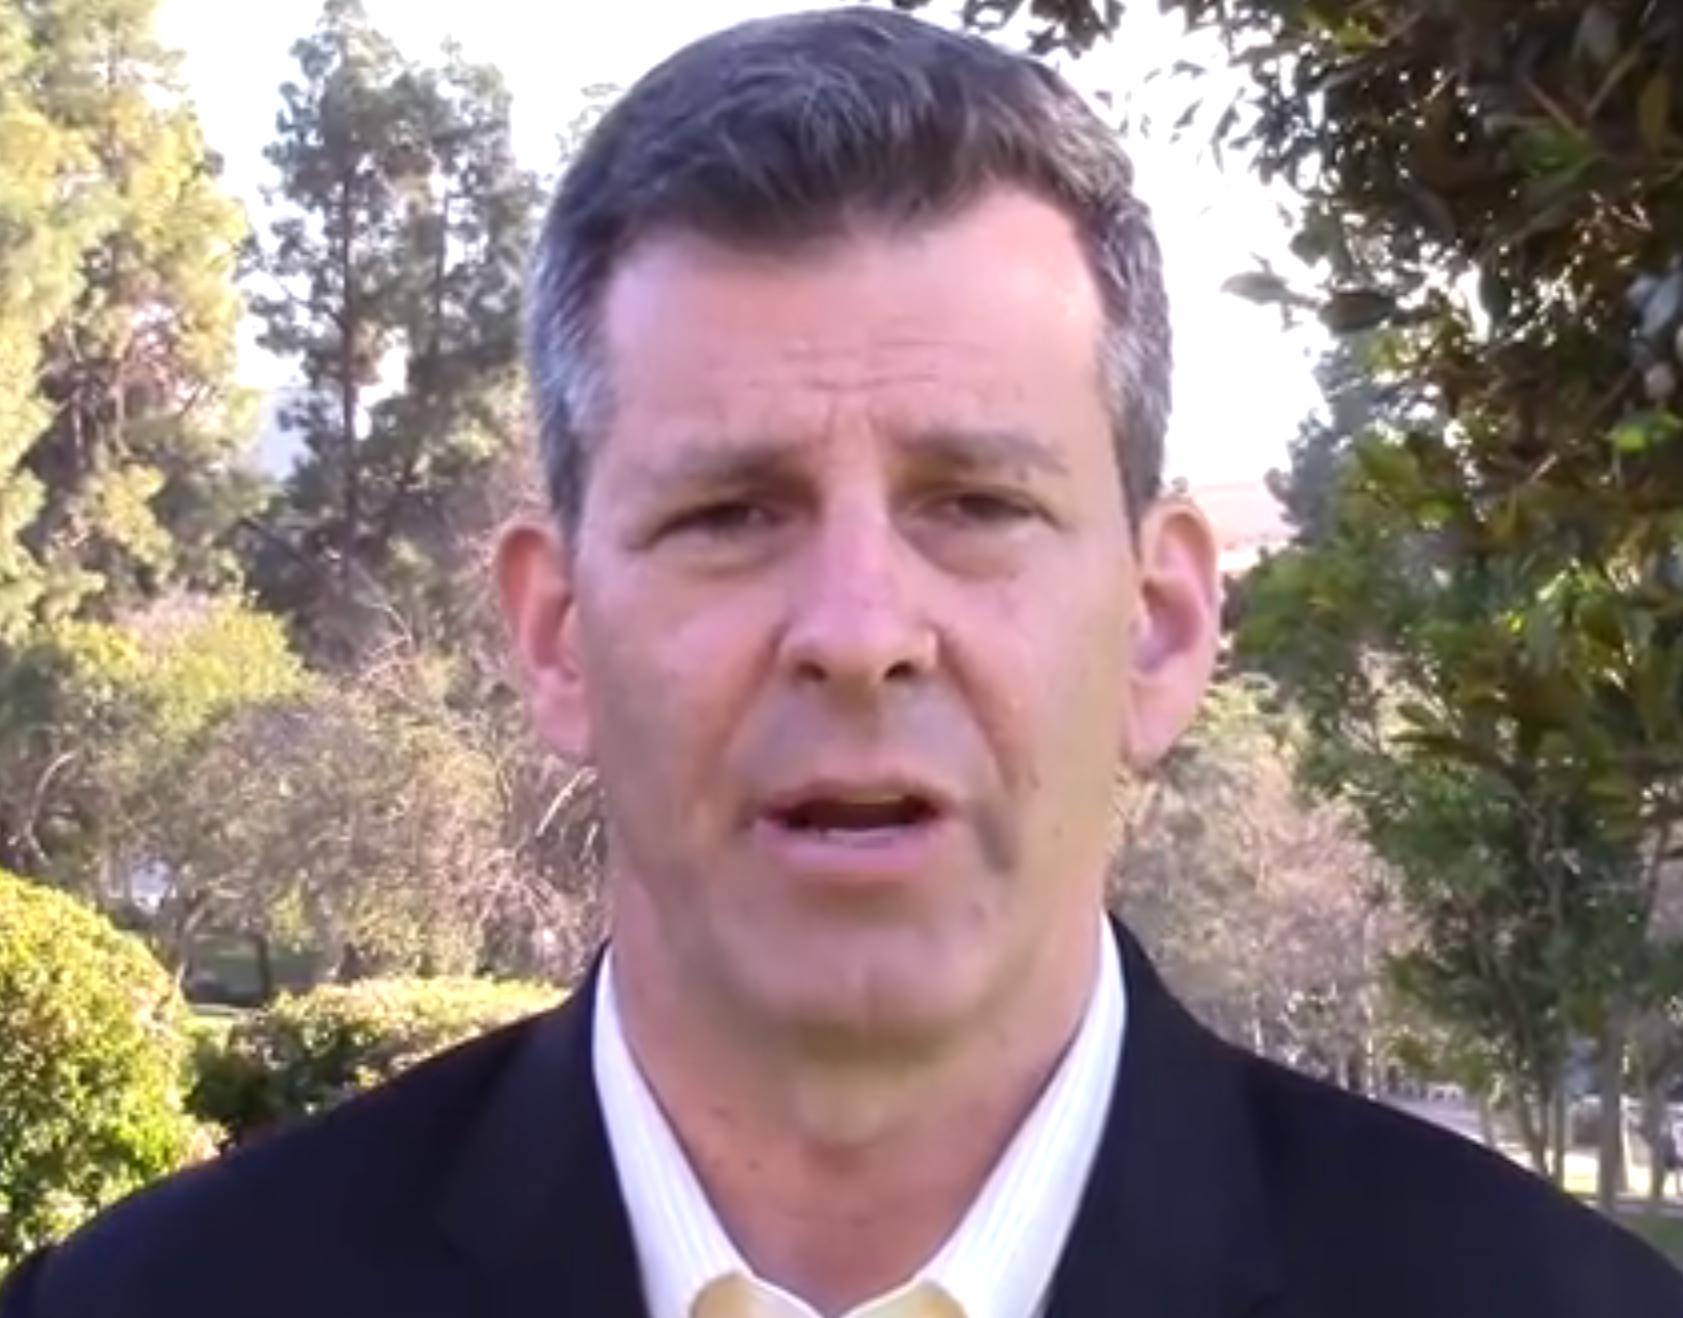 Waxman Race: Anti-Cellphone Candidate Robo-calls Cell Phones